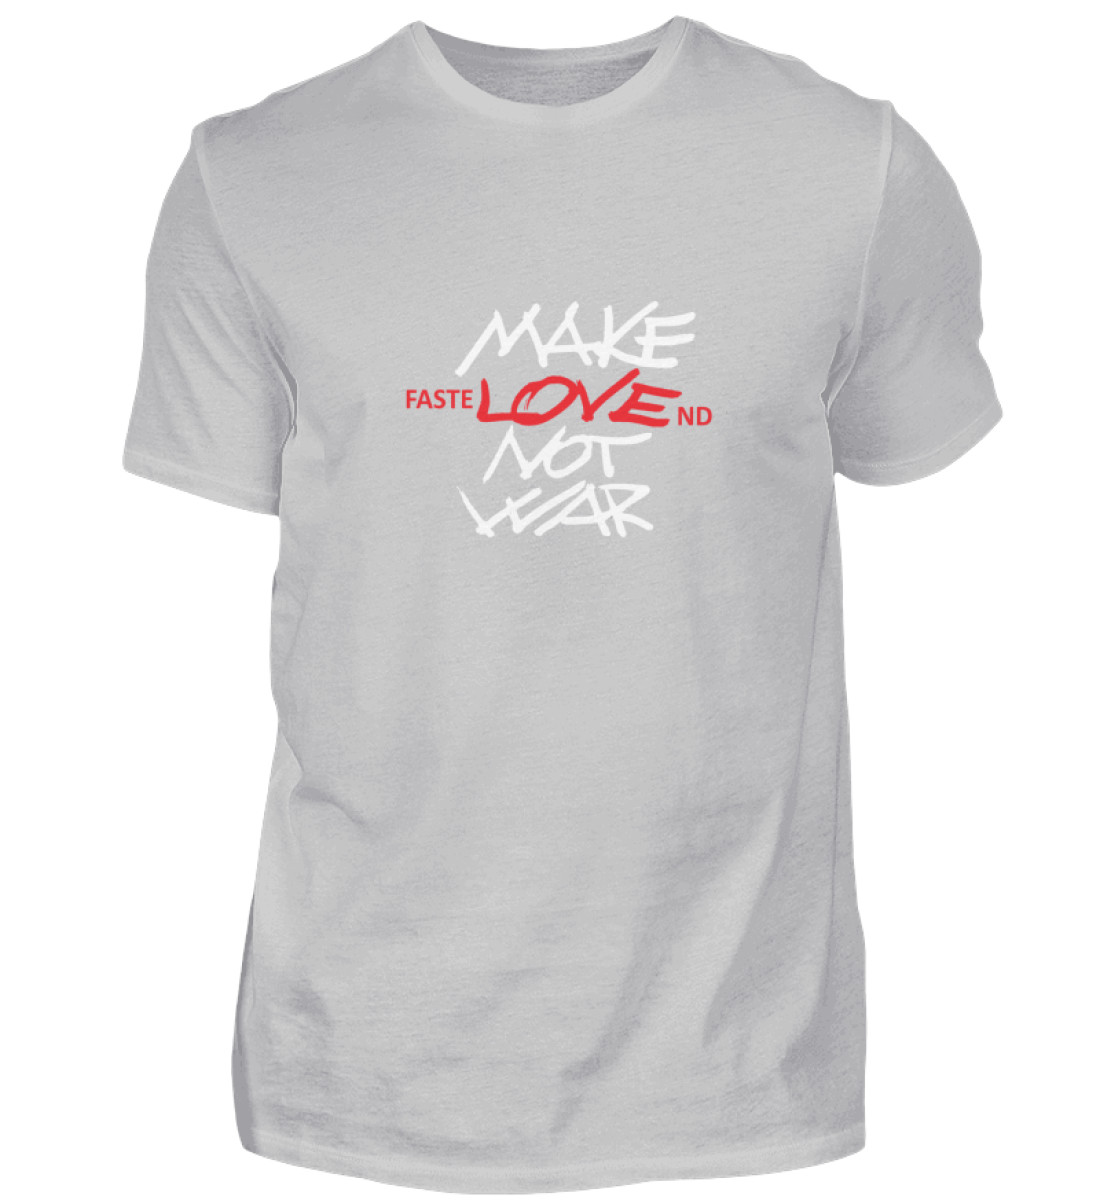 FasteLOVEnd Herren T-Shirt - Herren Shirt-1157